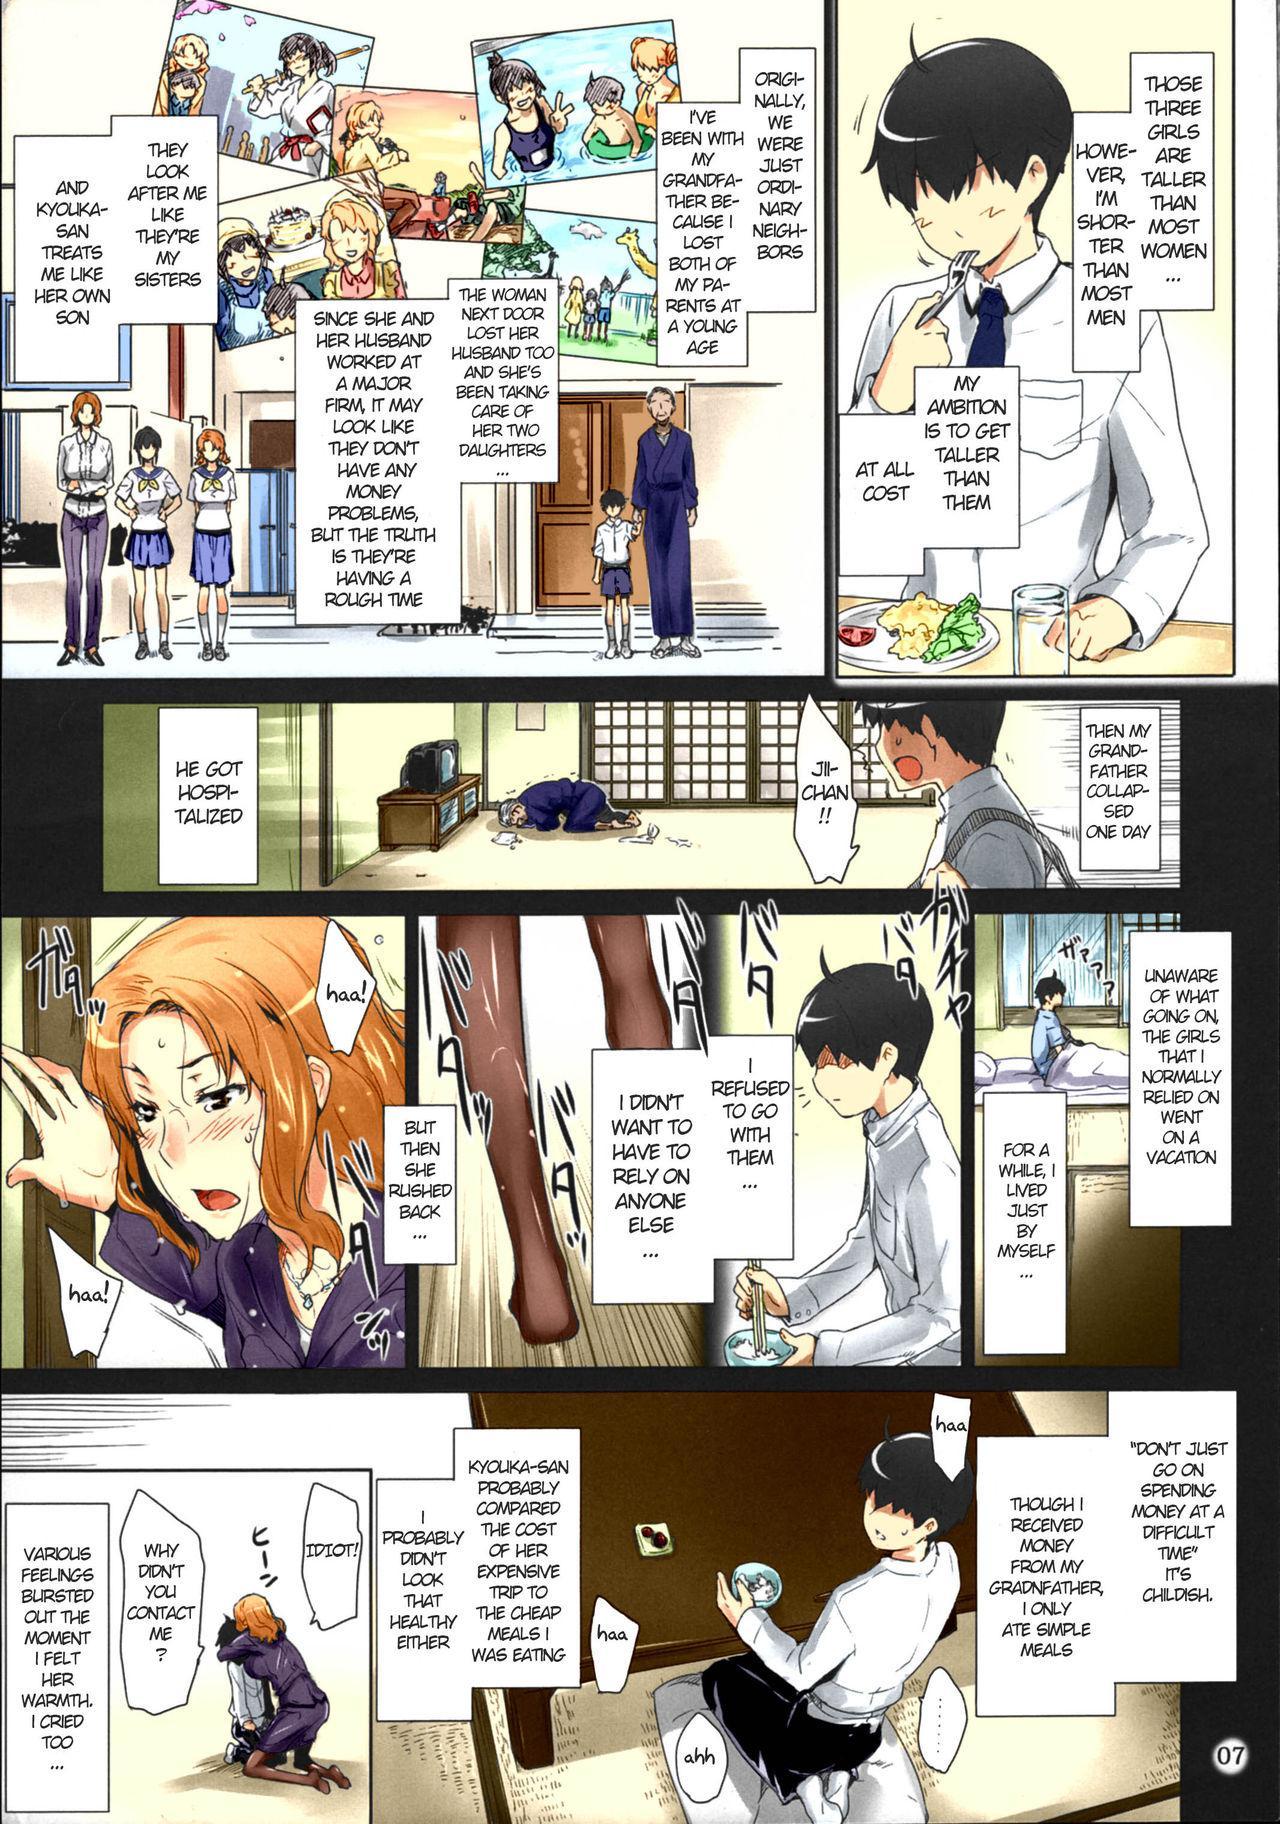 (C86) [MTSP (Jin)] Tachibana-san-chi no Dansei Jijou Matome Ban [English] [Colorized] 6